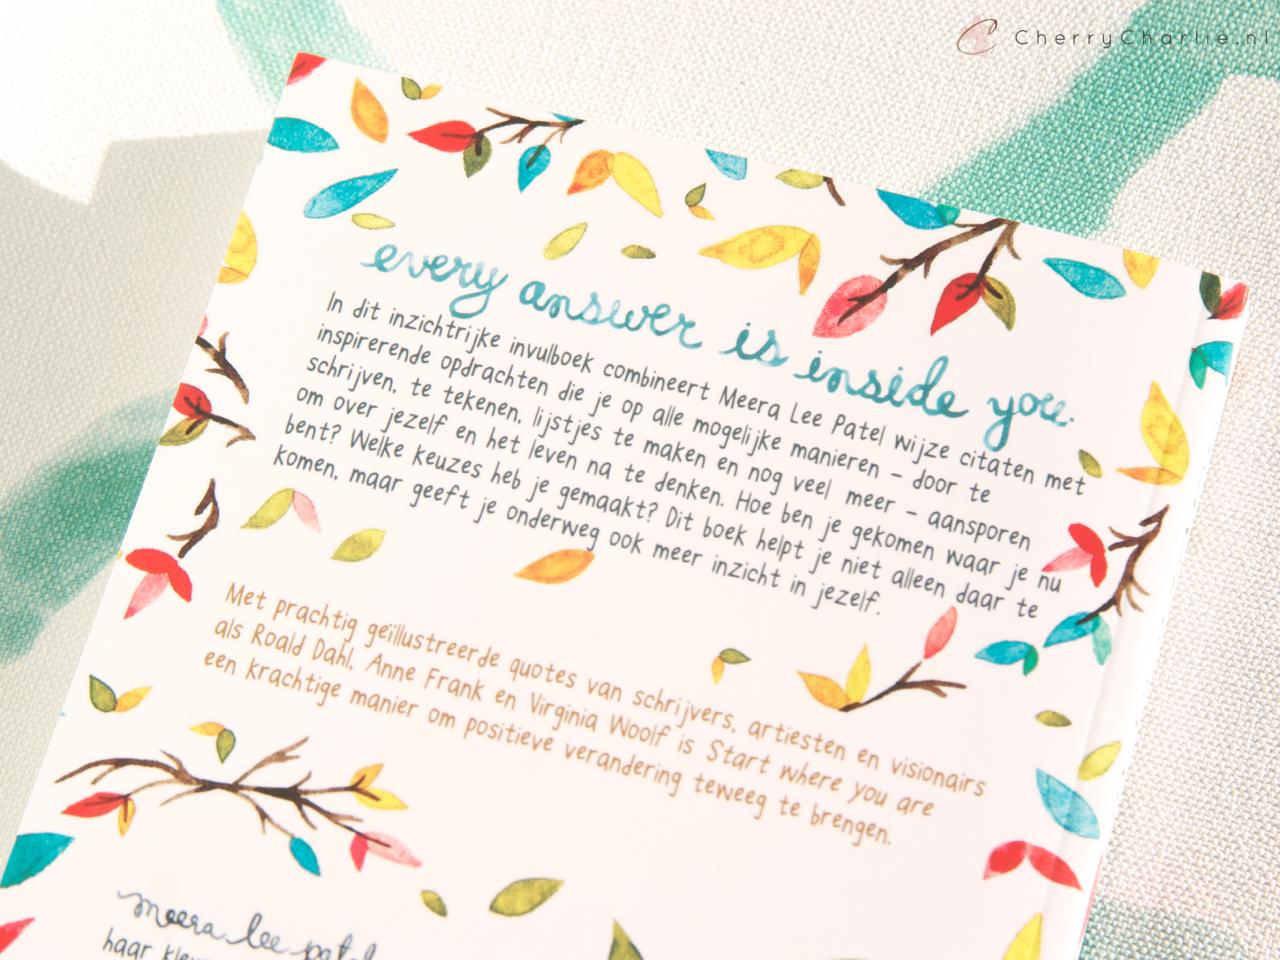 Citaten Roald Dahl : Mindfulness start where you are cherrycharlie